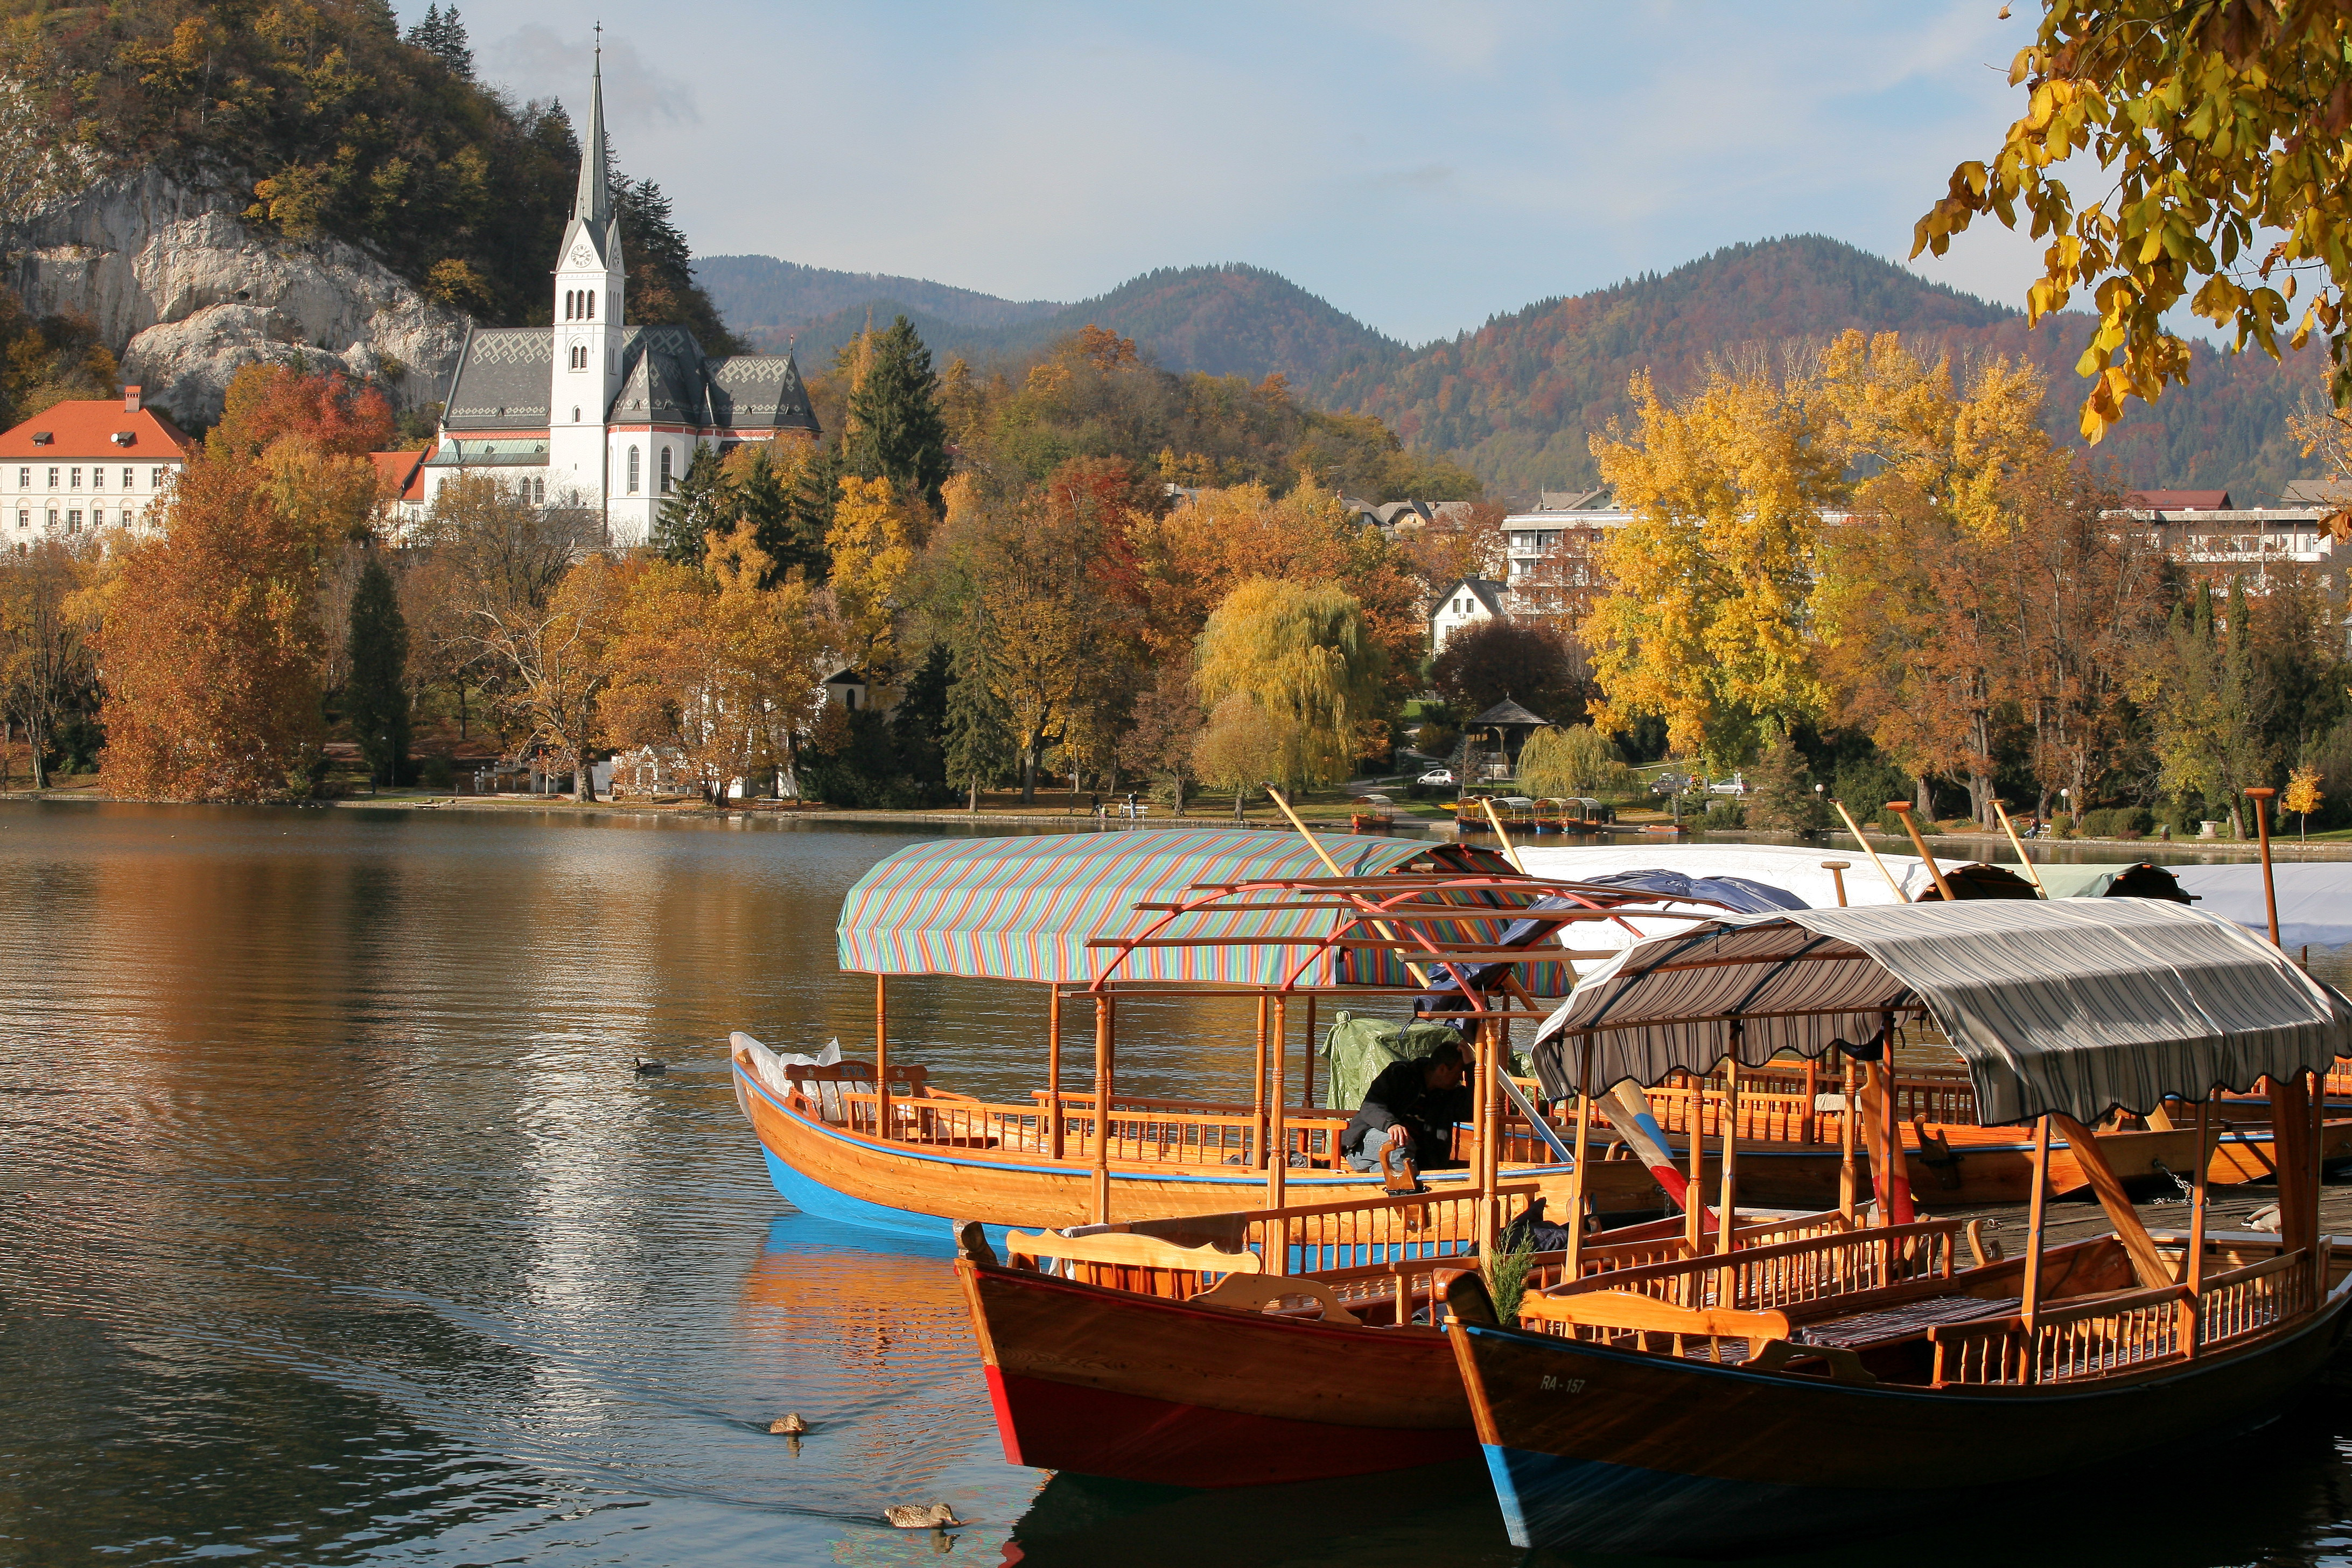 Ljubljana, jewel of Eastern Europe